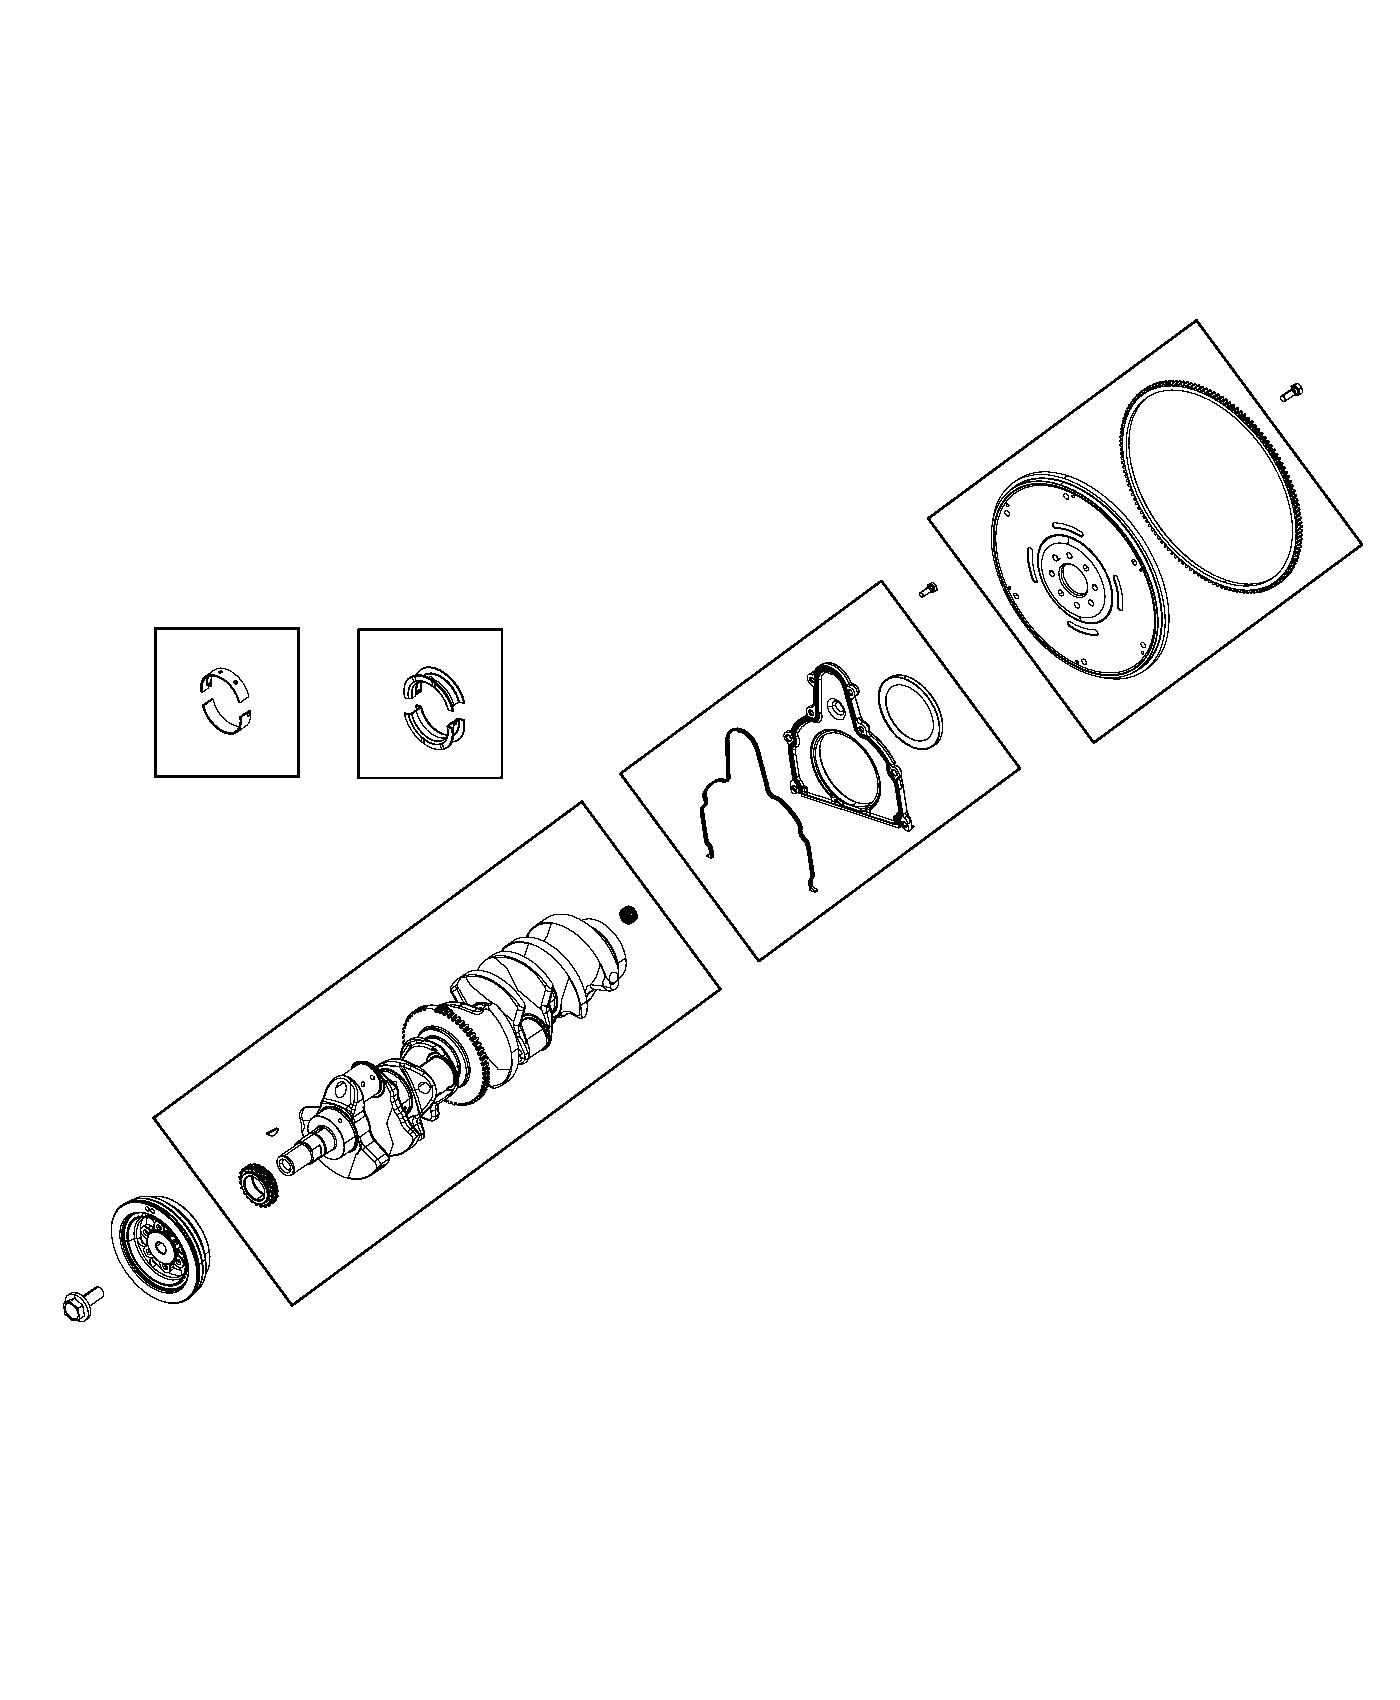 Dodge Viper Damper Vibration Crankshaft Bearings